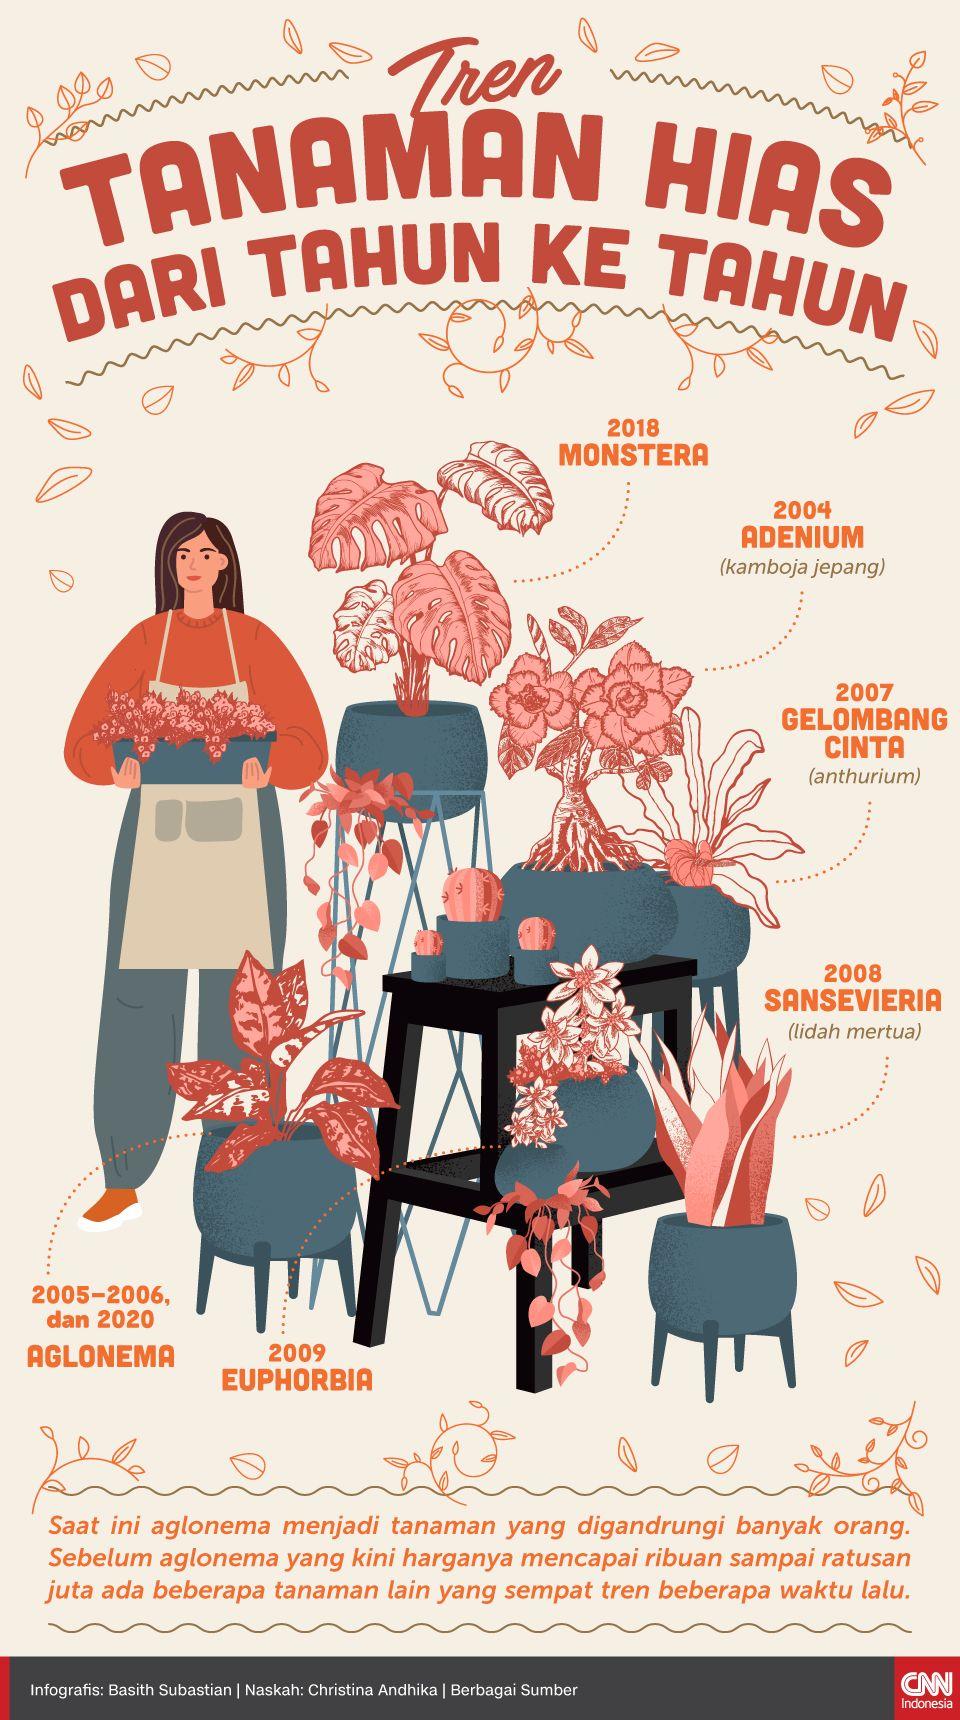 Infografis Tren Tanaman Hias dari Tahun ke Tahun